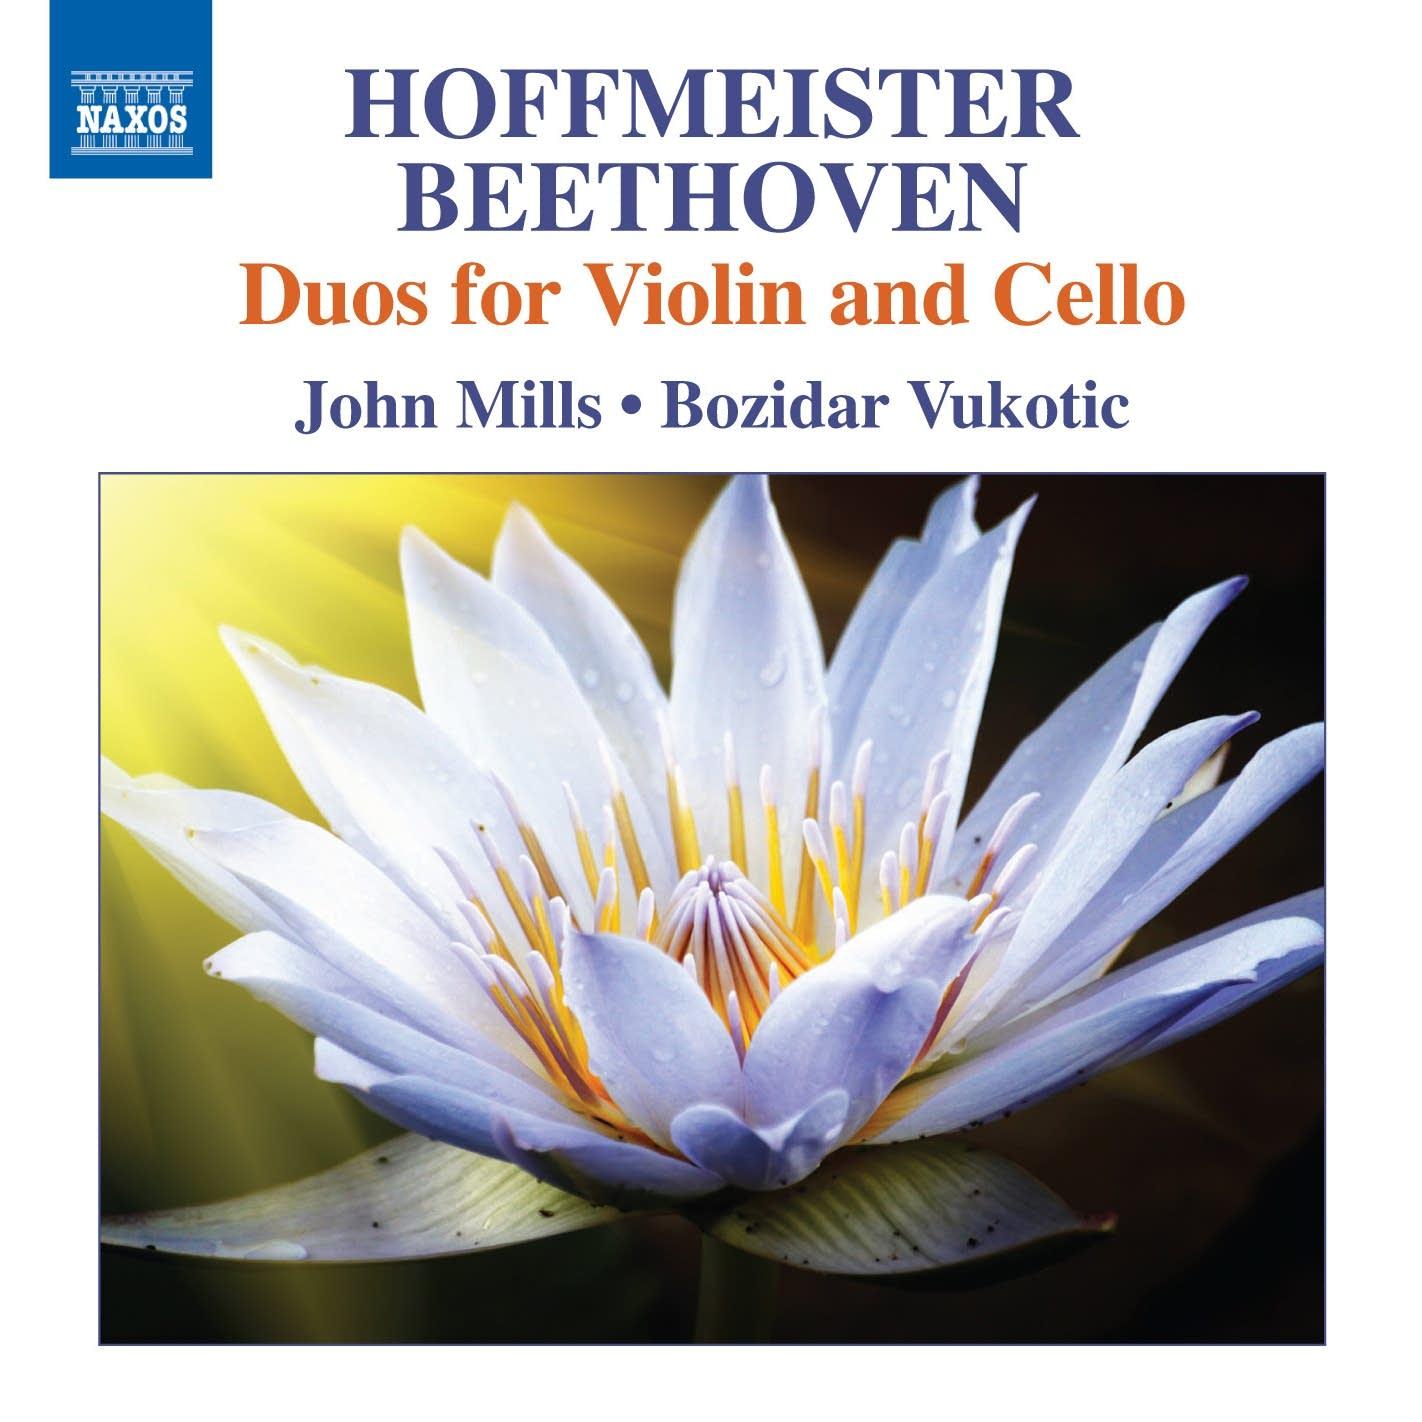 Beethoven - 3 duets,: No. 2: I.Allegro affetuoso